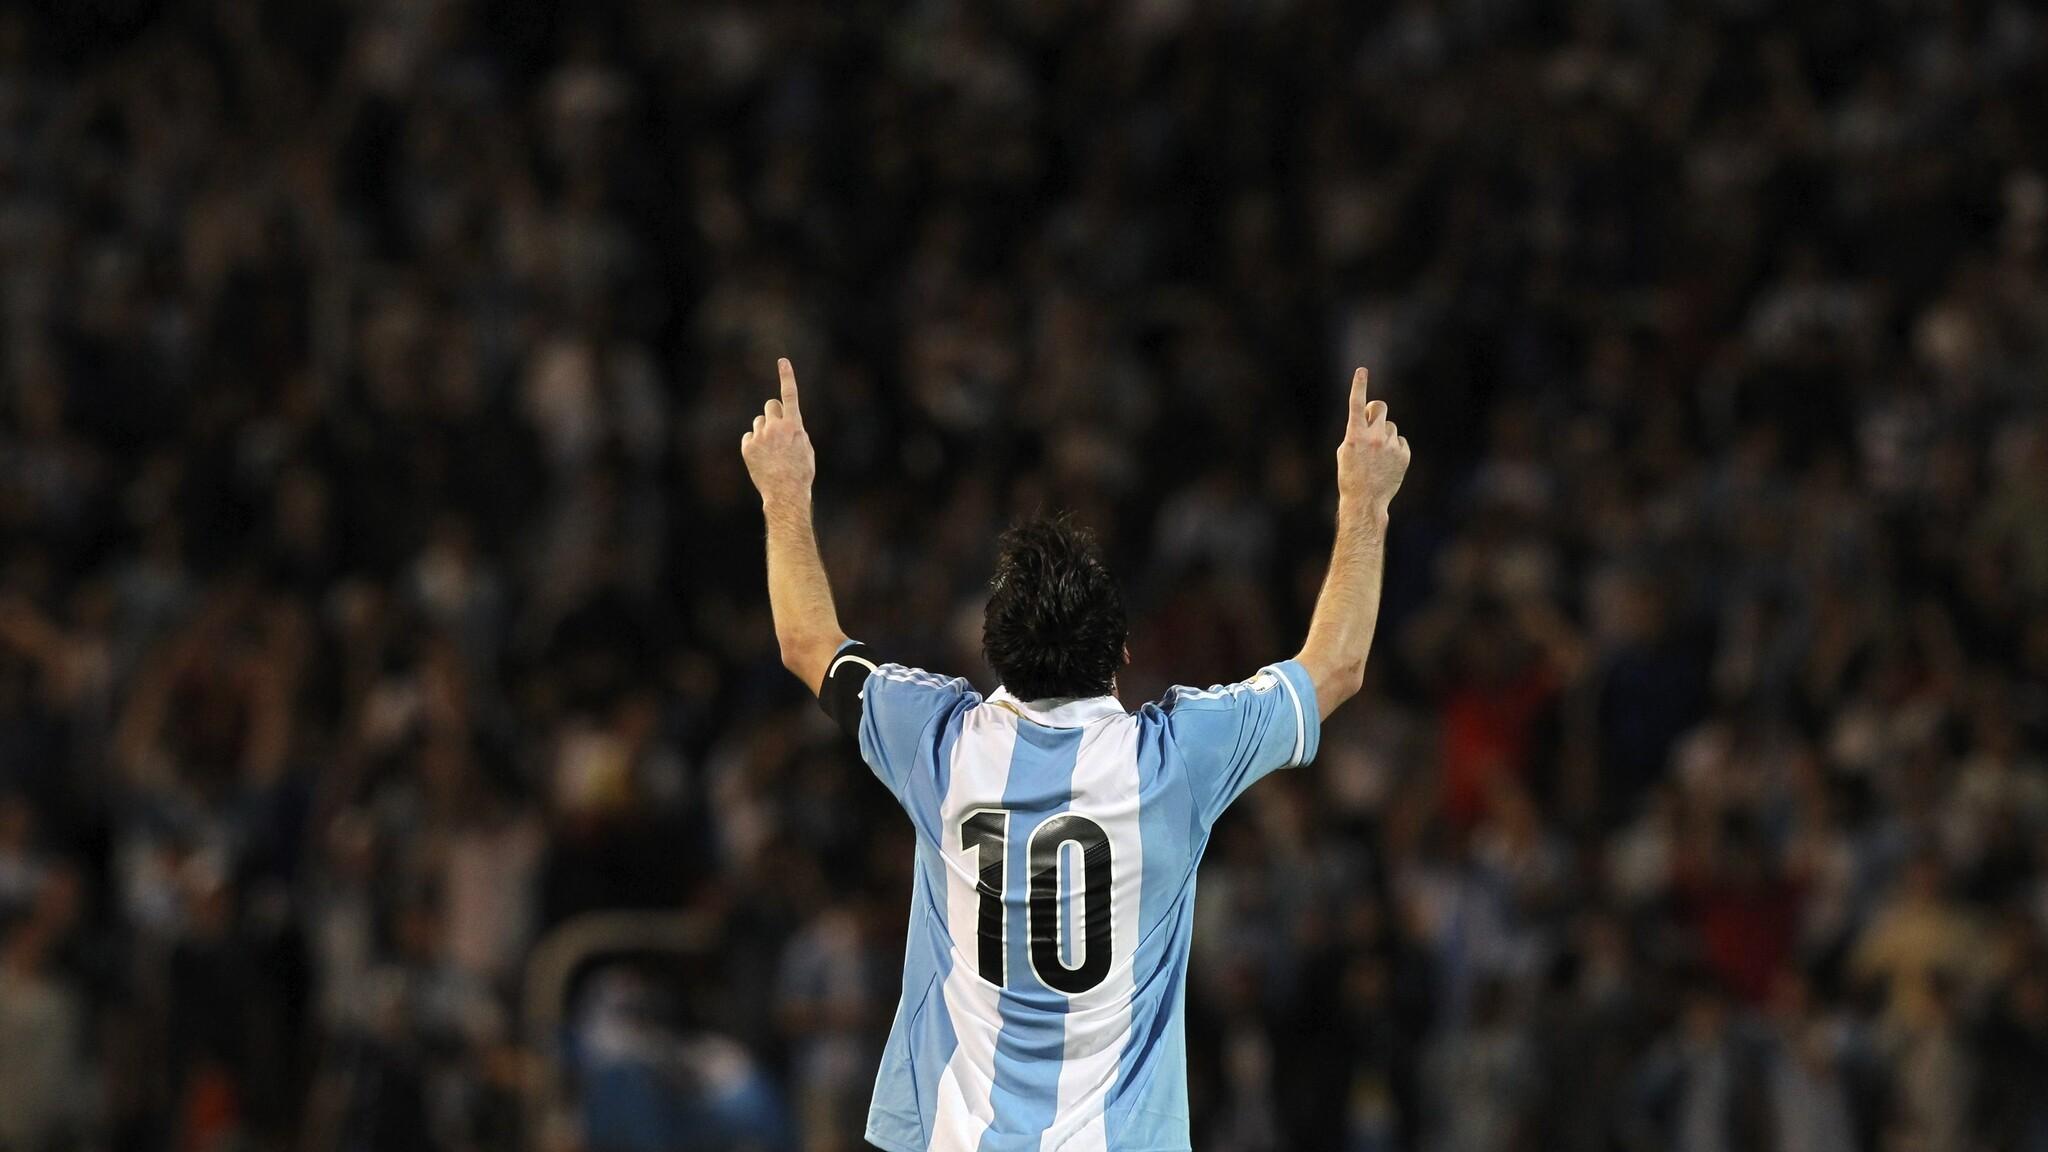 leo-messi-argentina-image.jpg